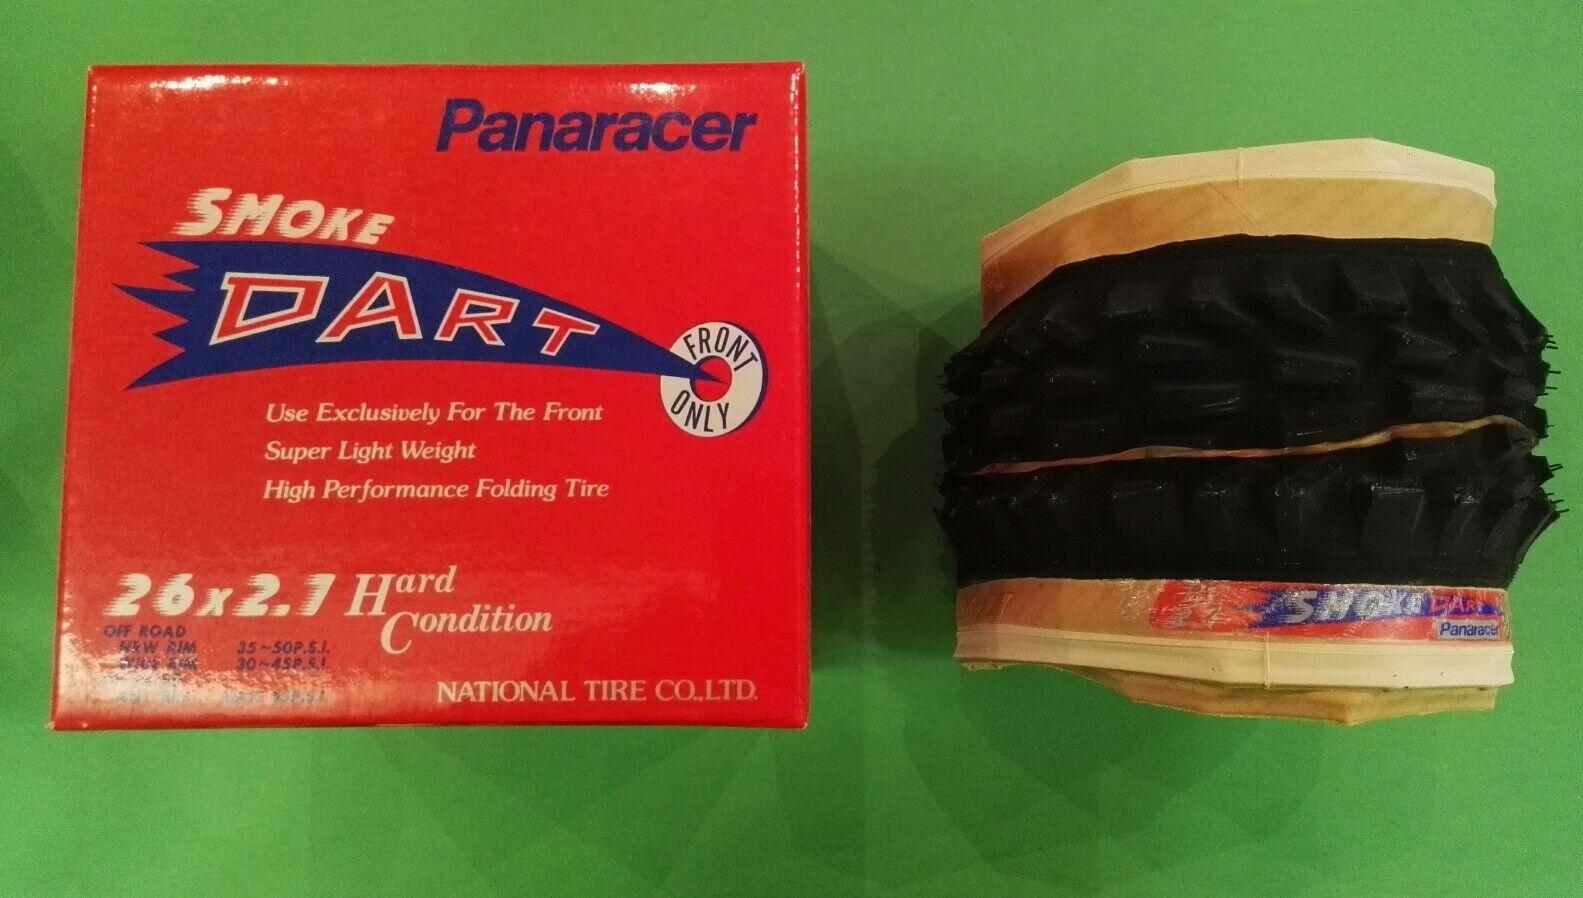 Tire Panaracer Smoke Dart competition 26x2.1 Tire Vintage Rare